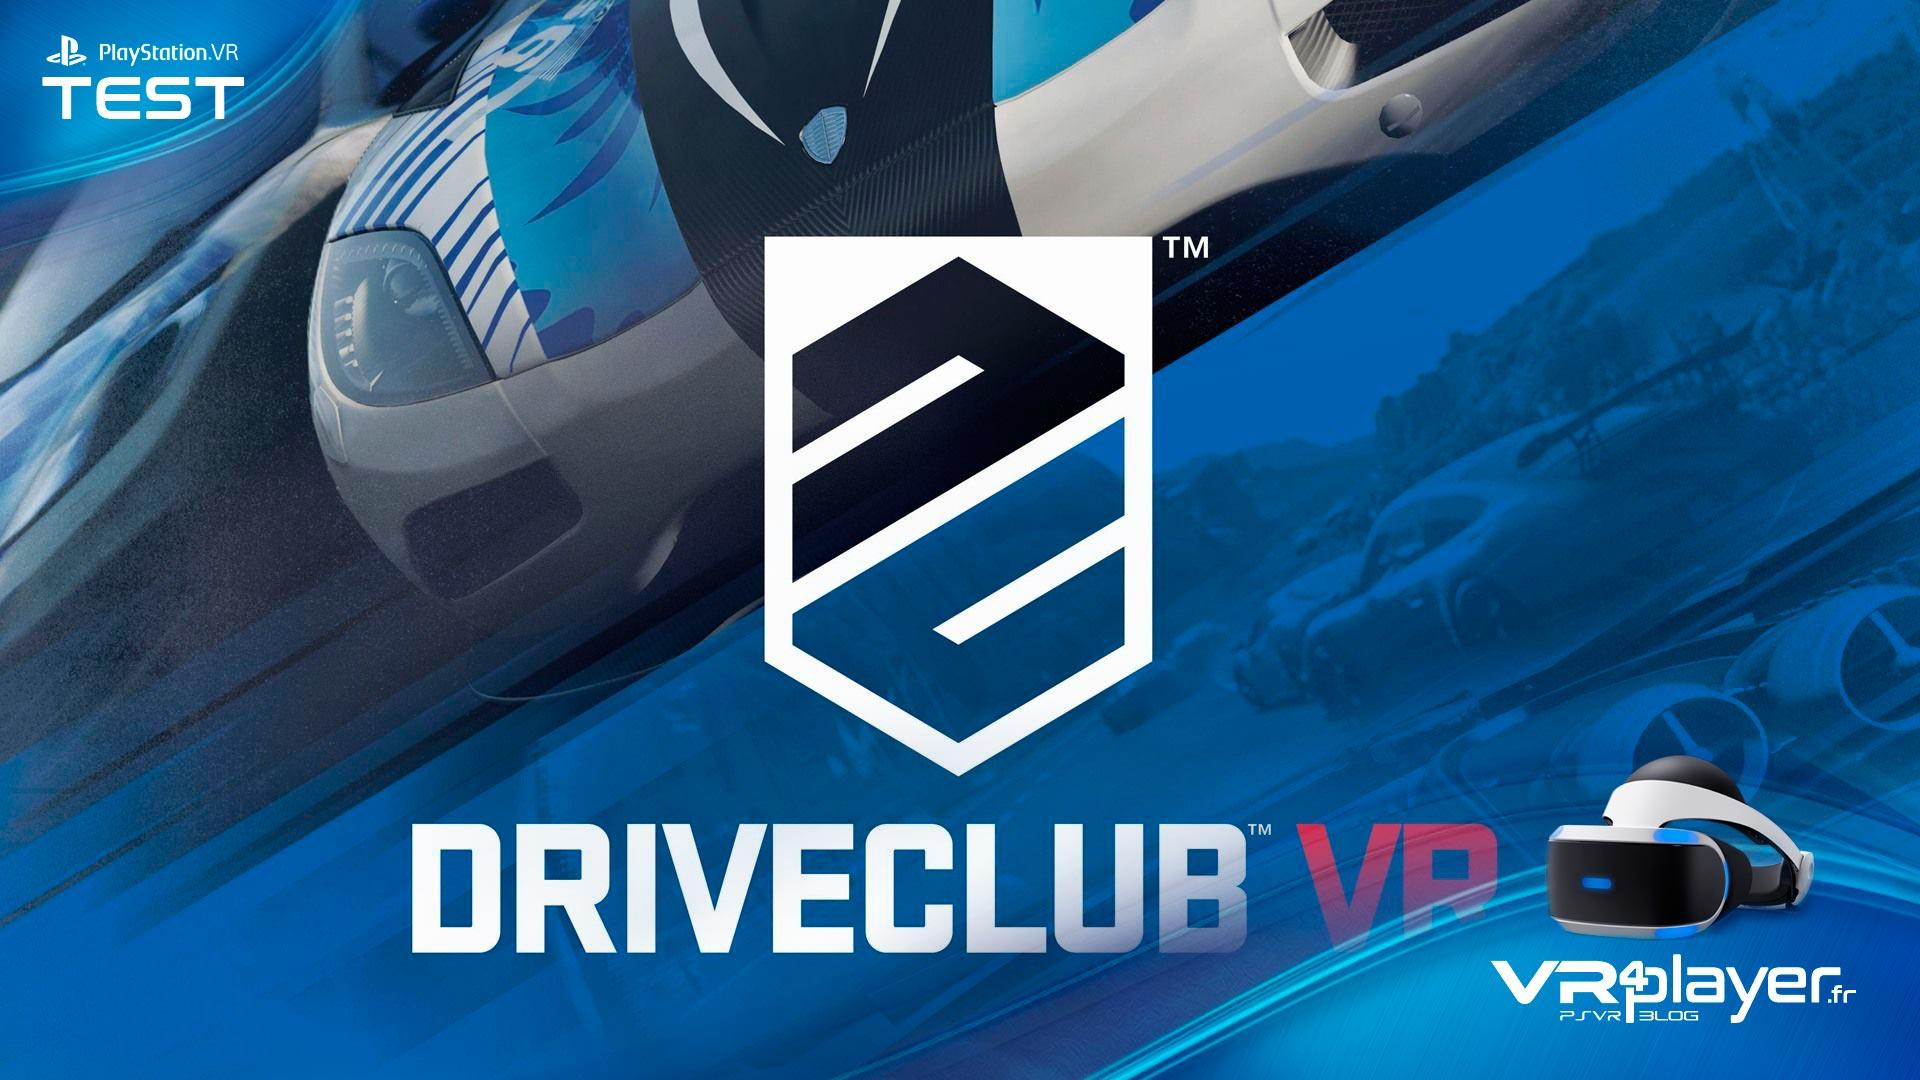 DriveClub VR Test Review PSVR VR4player